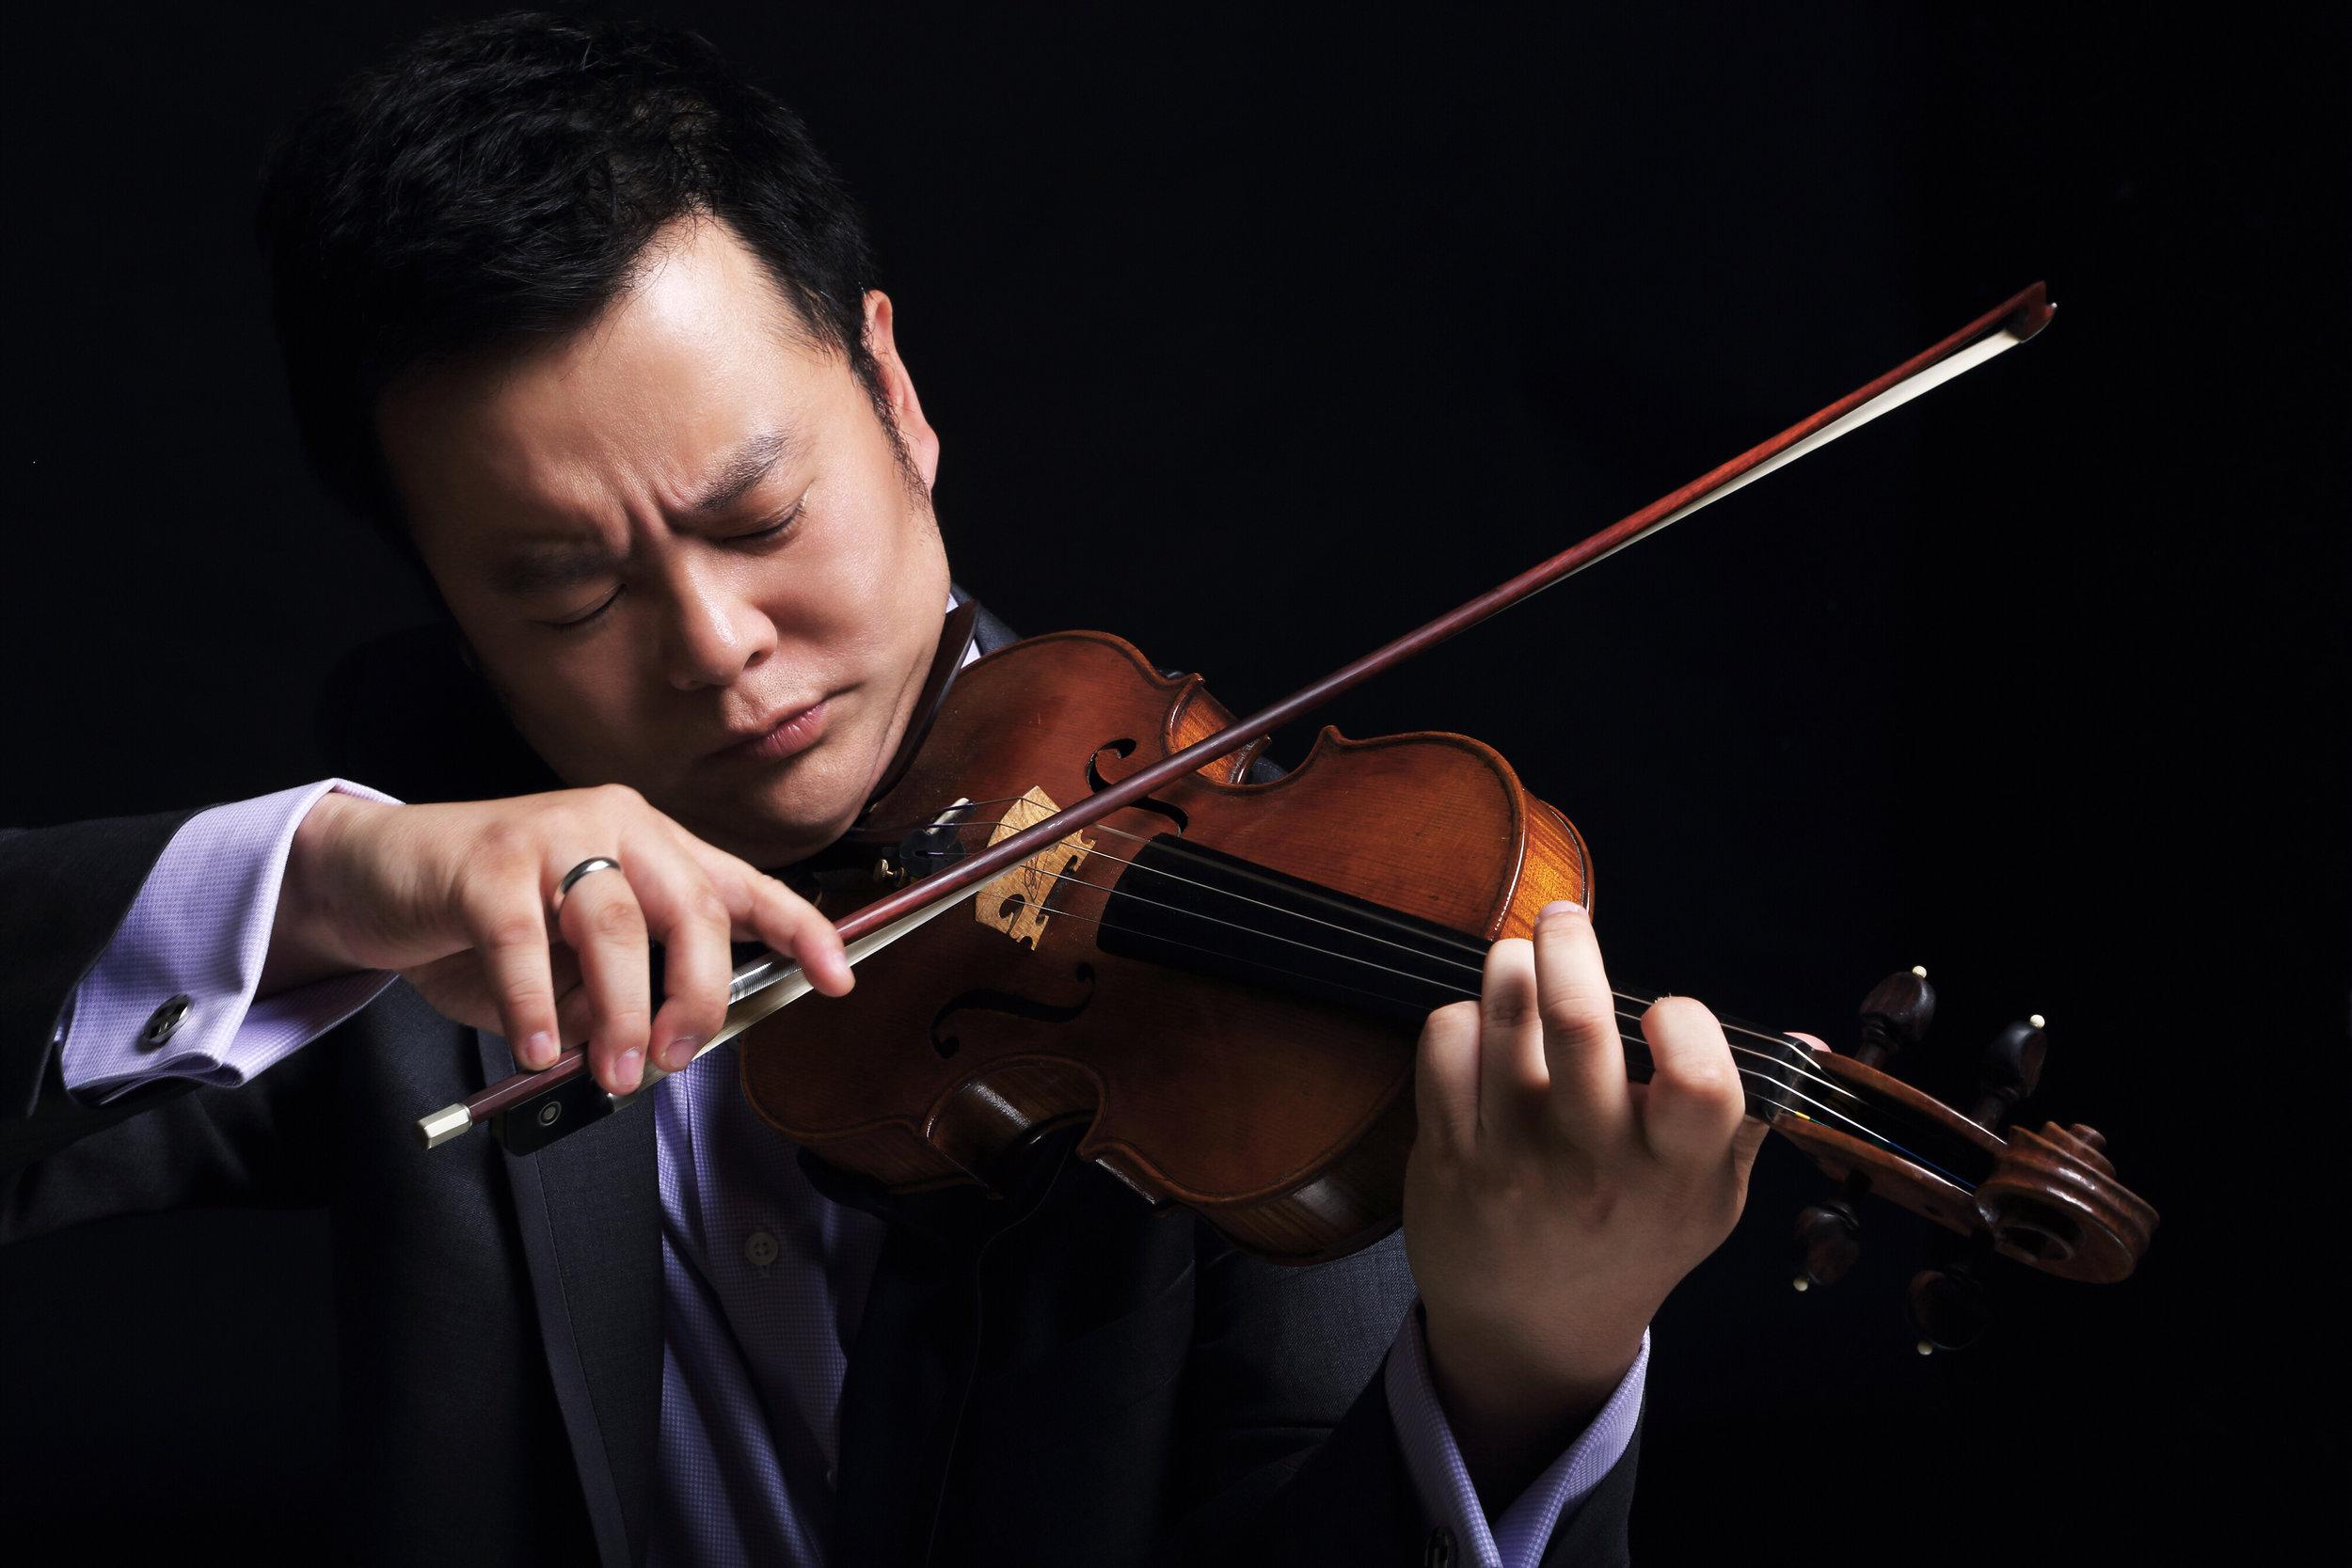 Quan Yuan  The Metropolitan Orchestra Violinist  美国大都会歌剧院小提琴演奏家